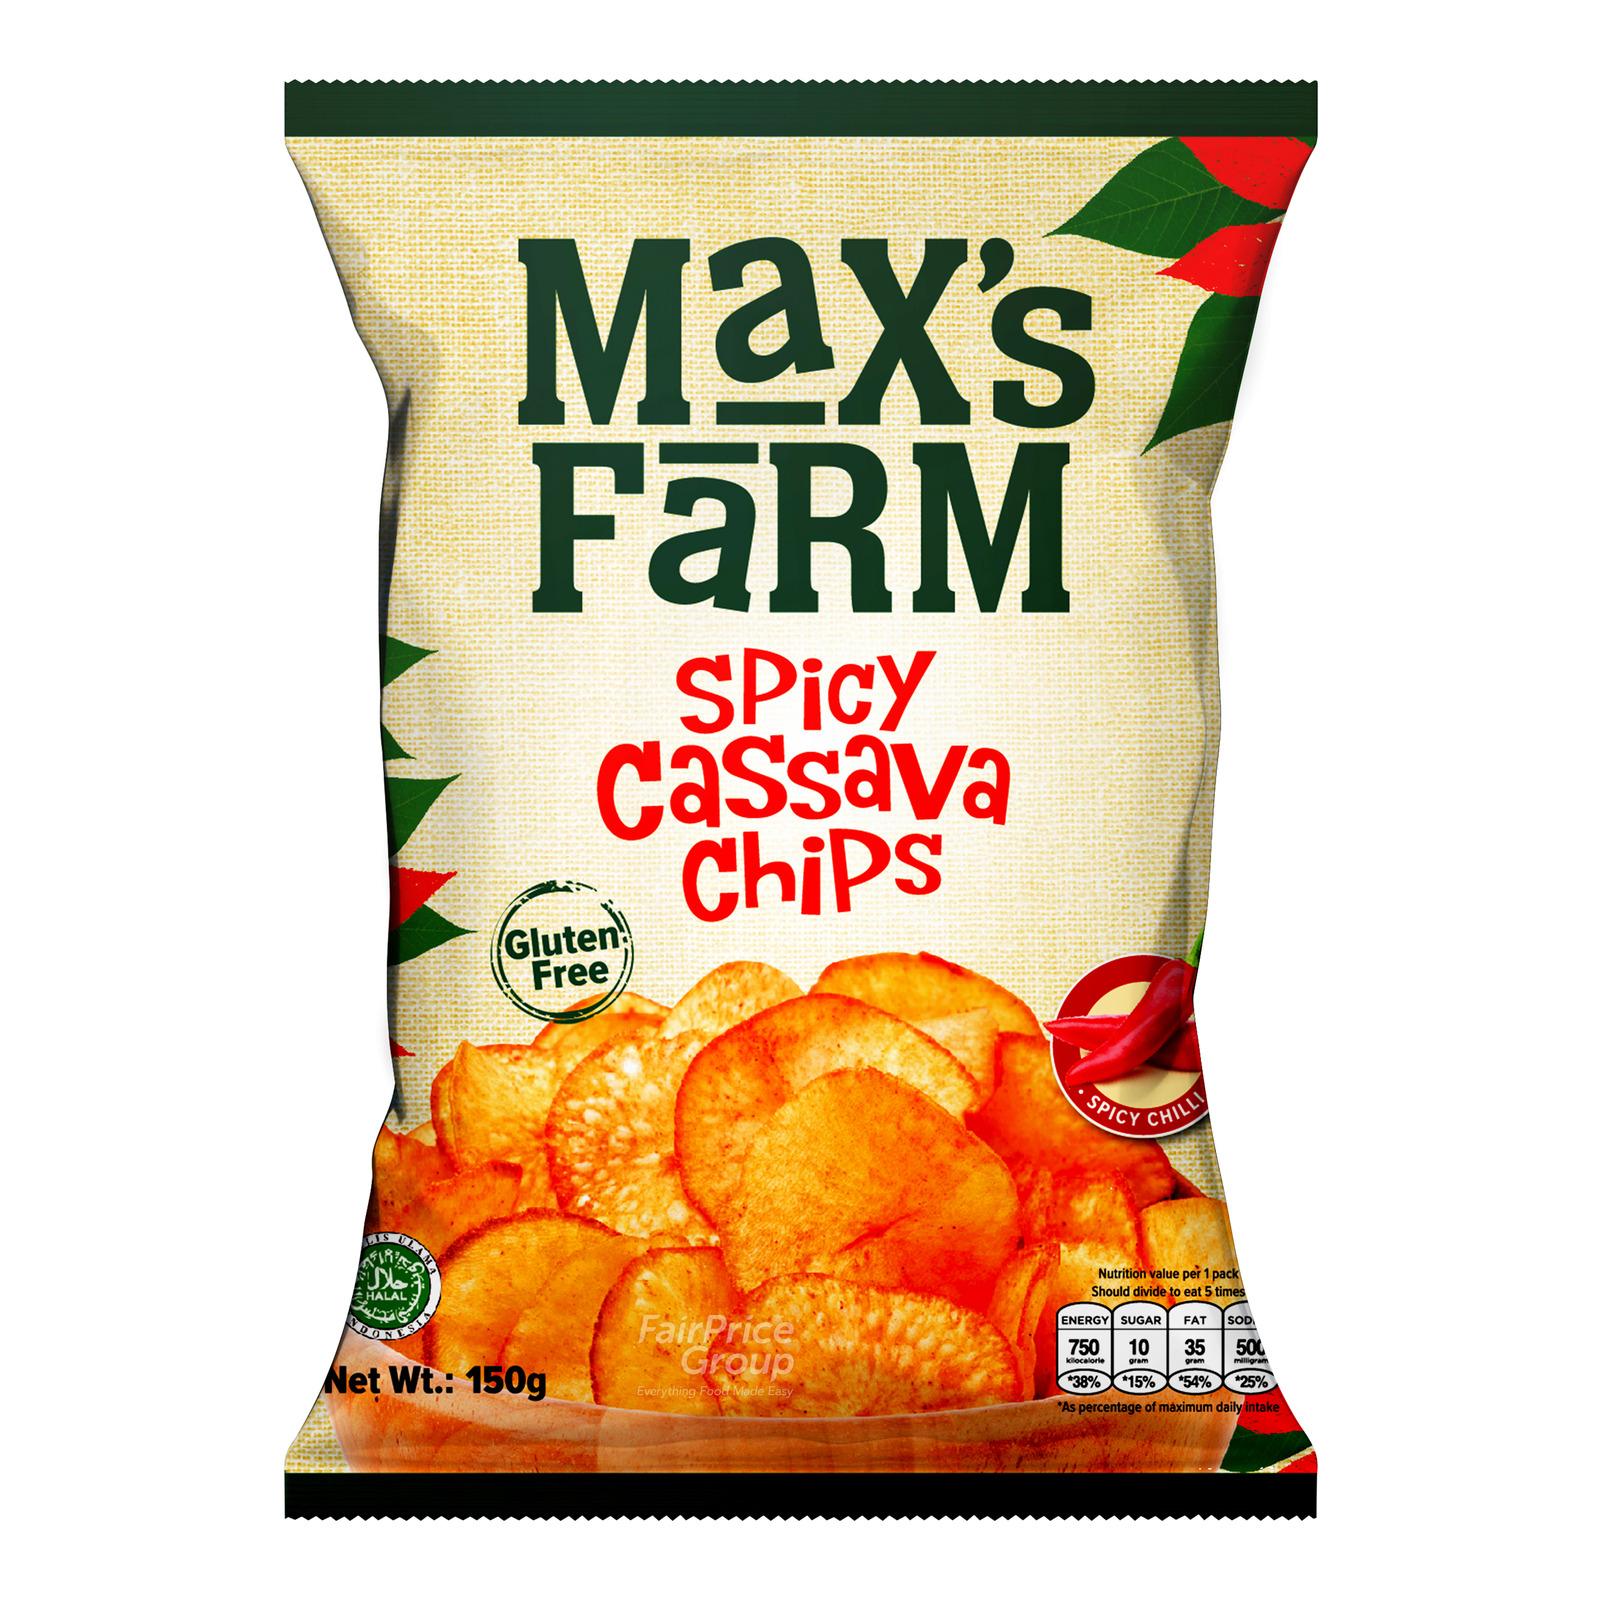 Max's Farm Cassava Chips - Spicy